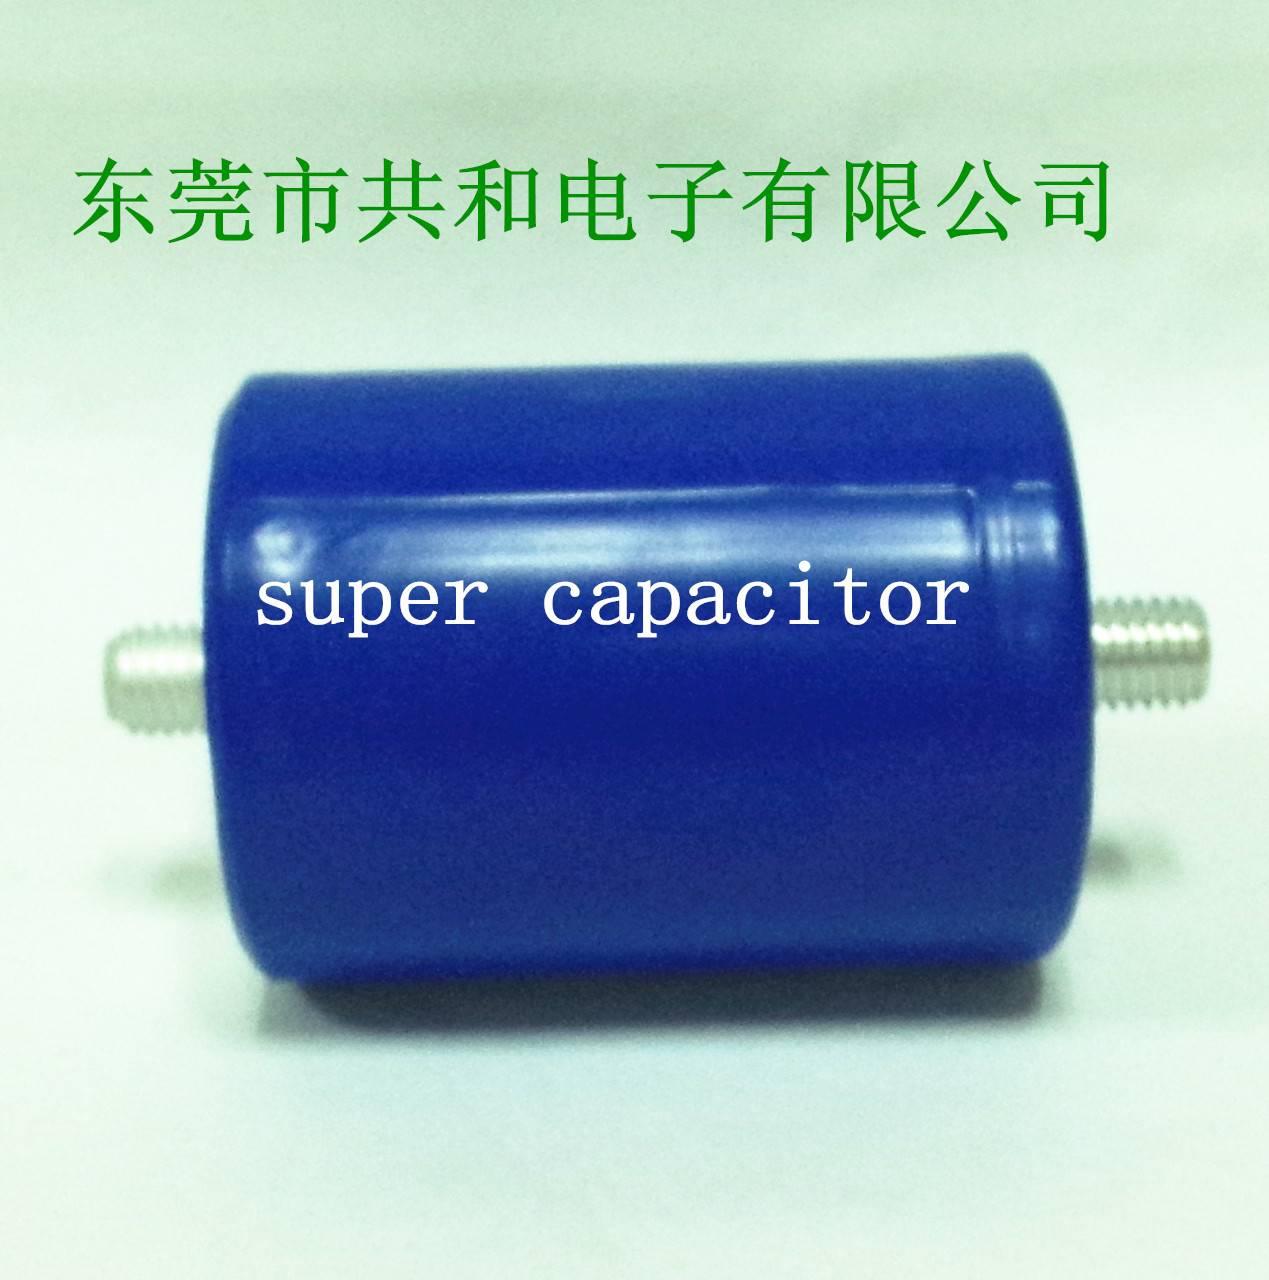 super capacitor 1200f 2.7v